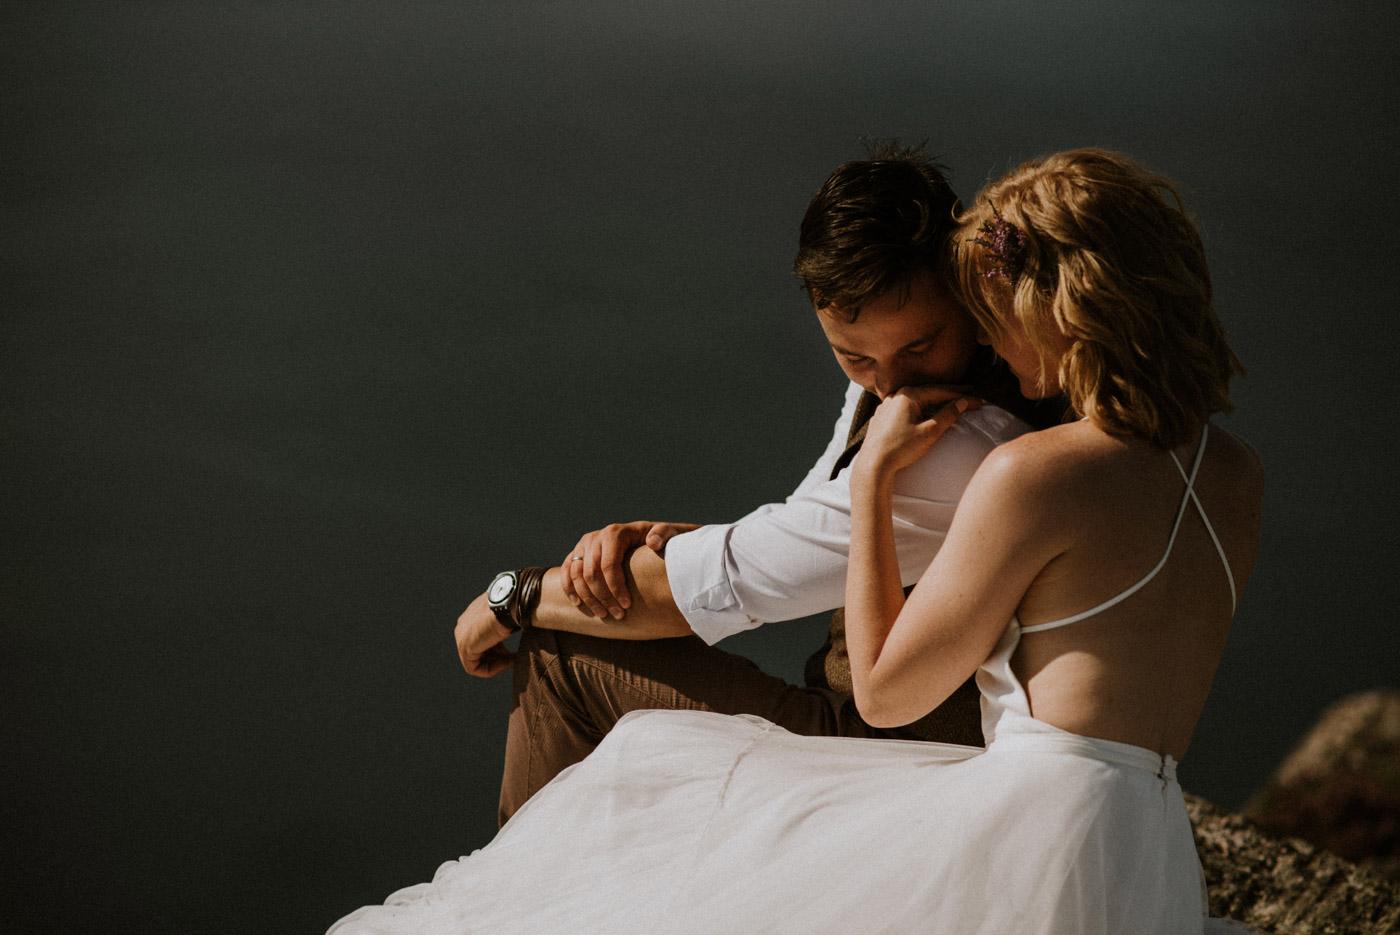 vestuvių fotosesija norvegijoje 9p